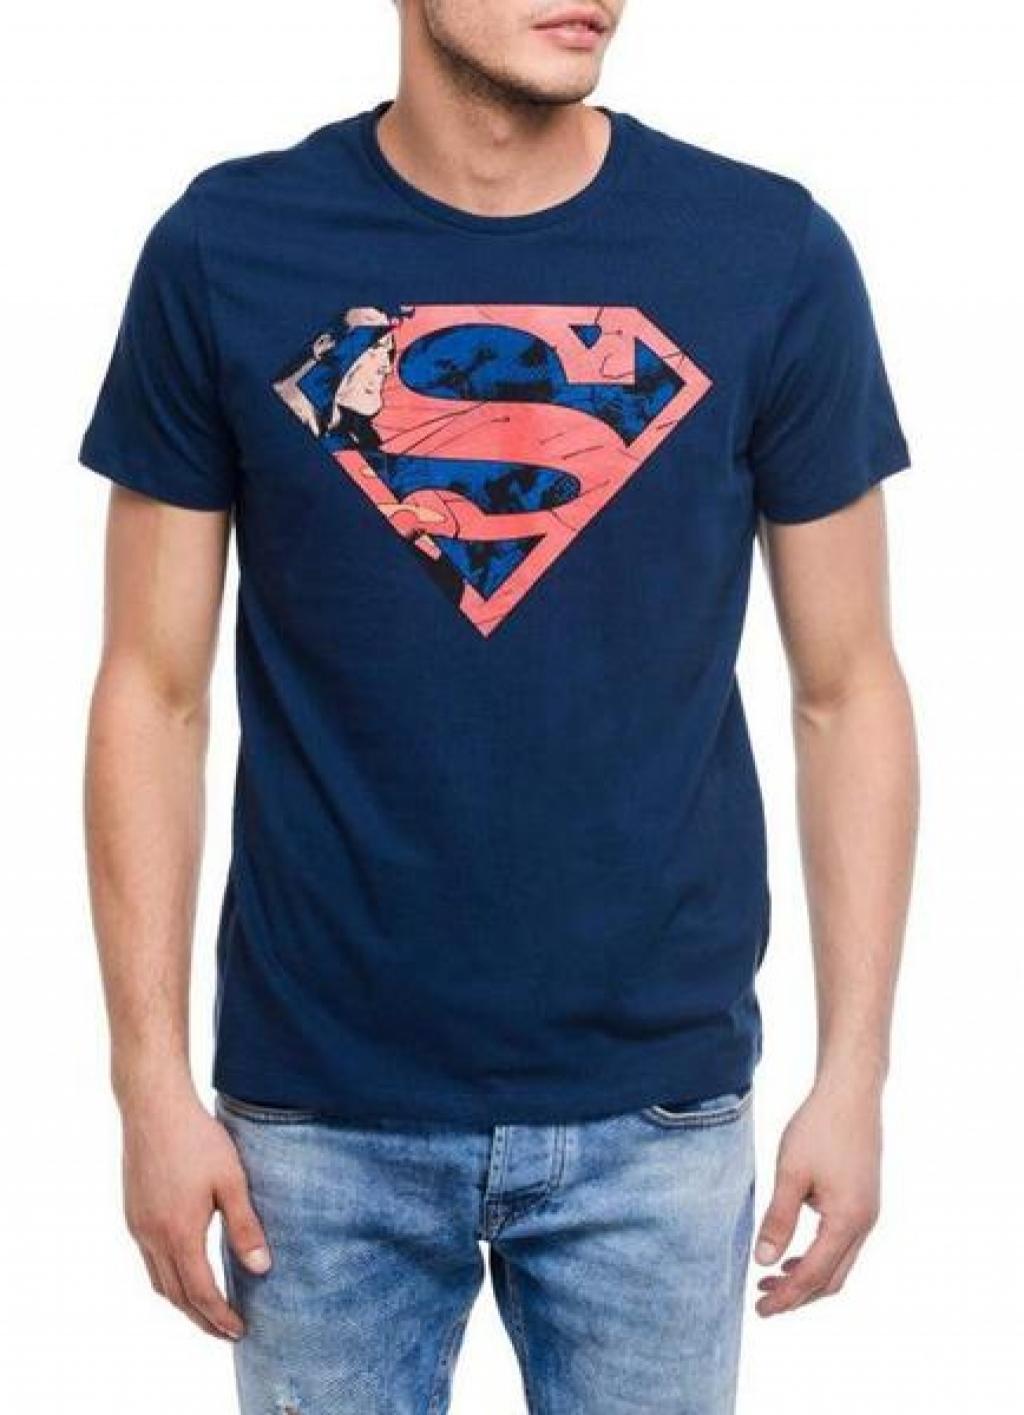 14993320530_Affordable_Superman_Fading_Soldier_Blue_Half_Sleeve_Men_T-Shirt.jpg